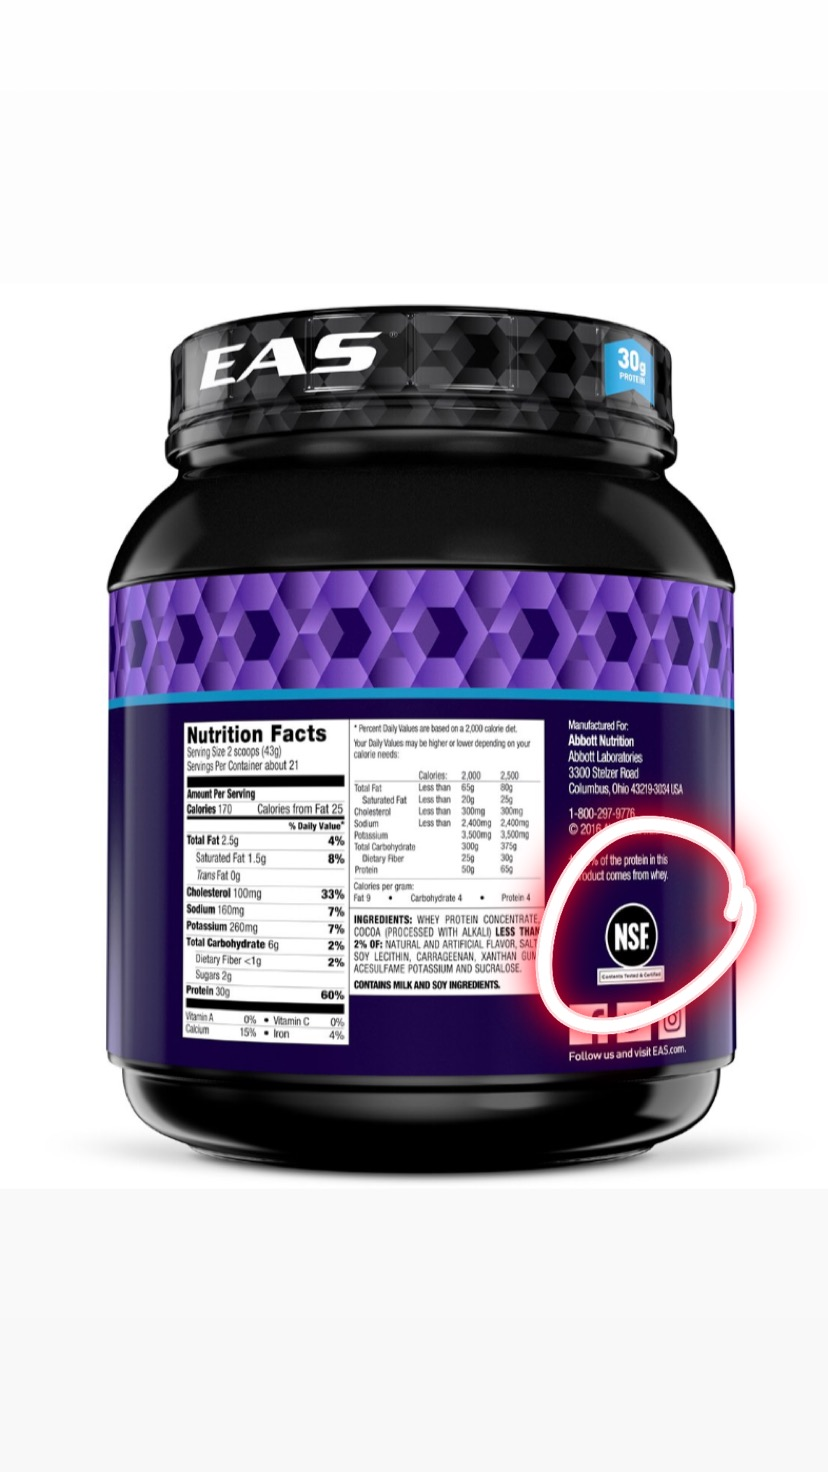 NSF protein.JPG